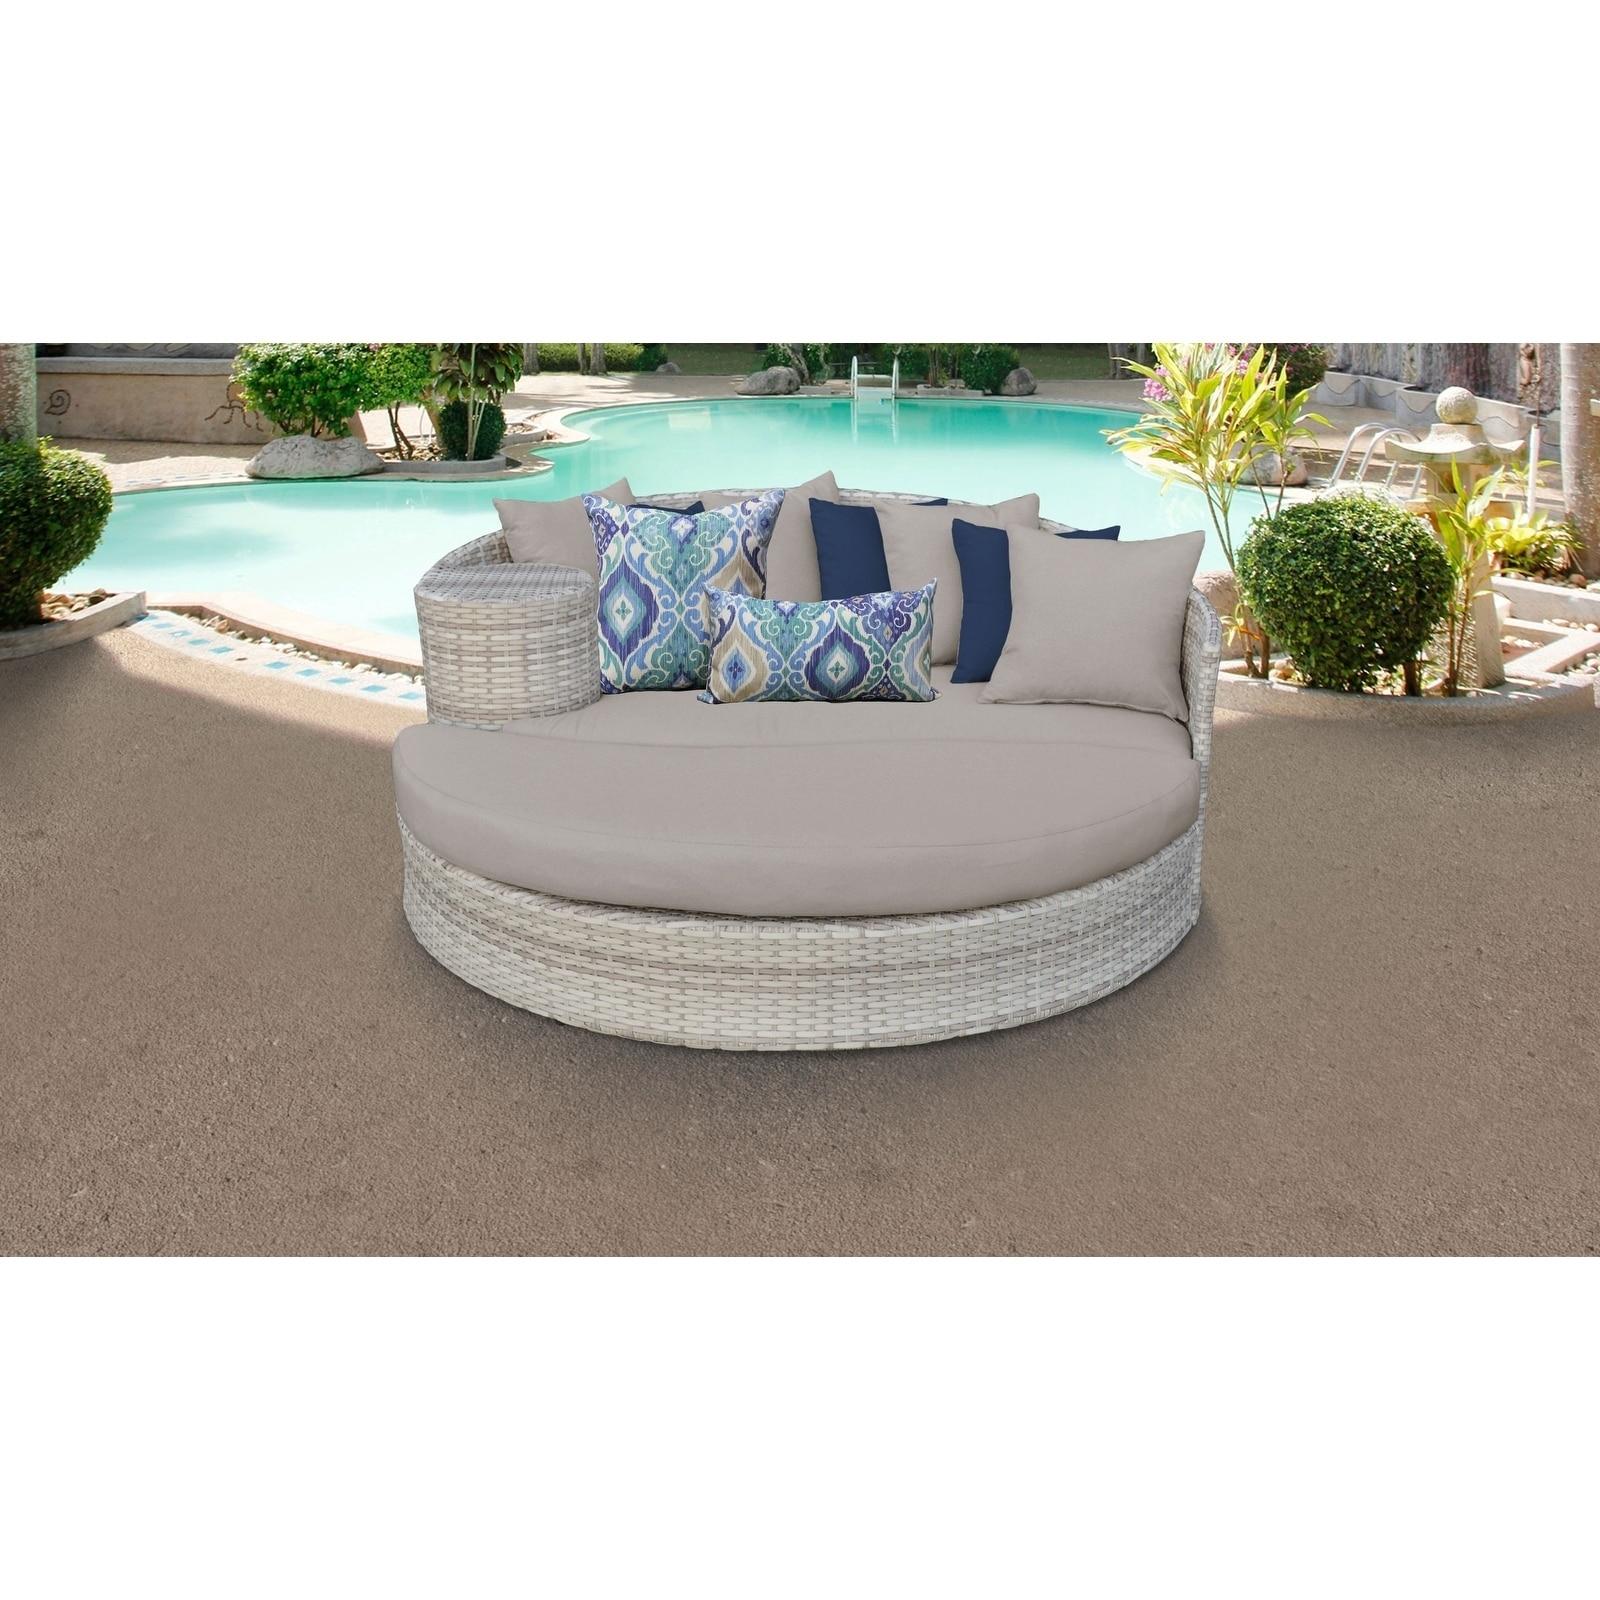 Marvelous Fairmont Circular Sun Bed Outdoor Wicker Patio Furniture Download Free Architecture Designs Embacsunscenecom